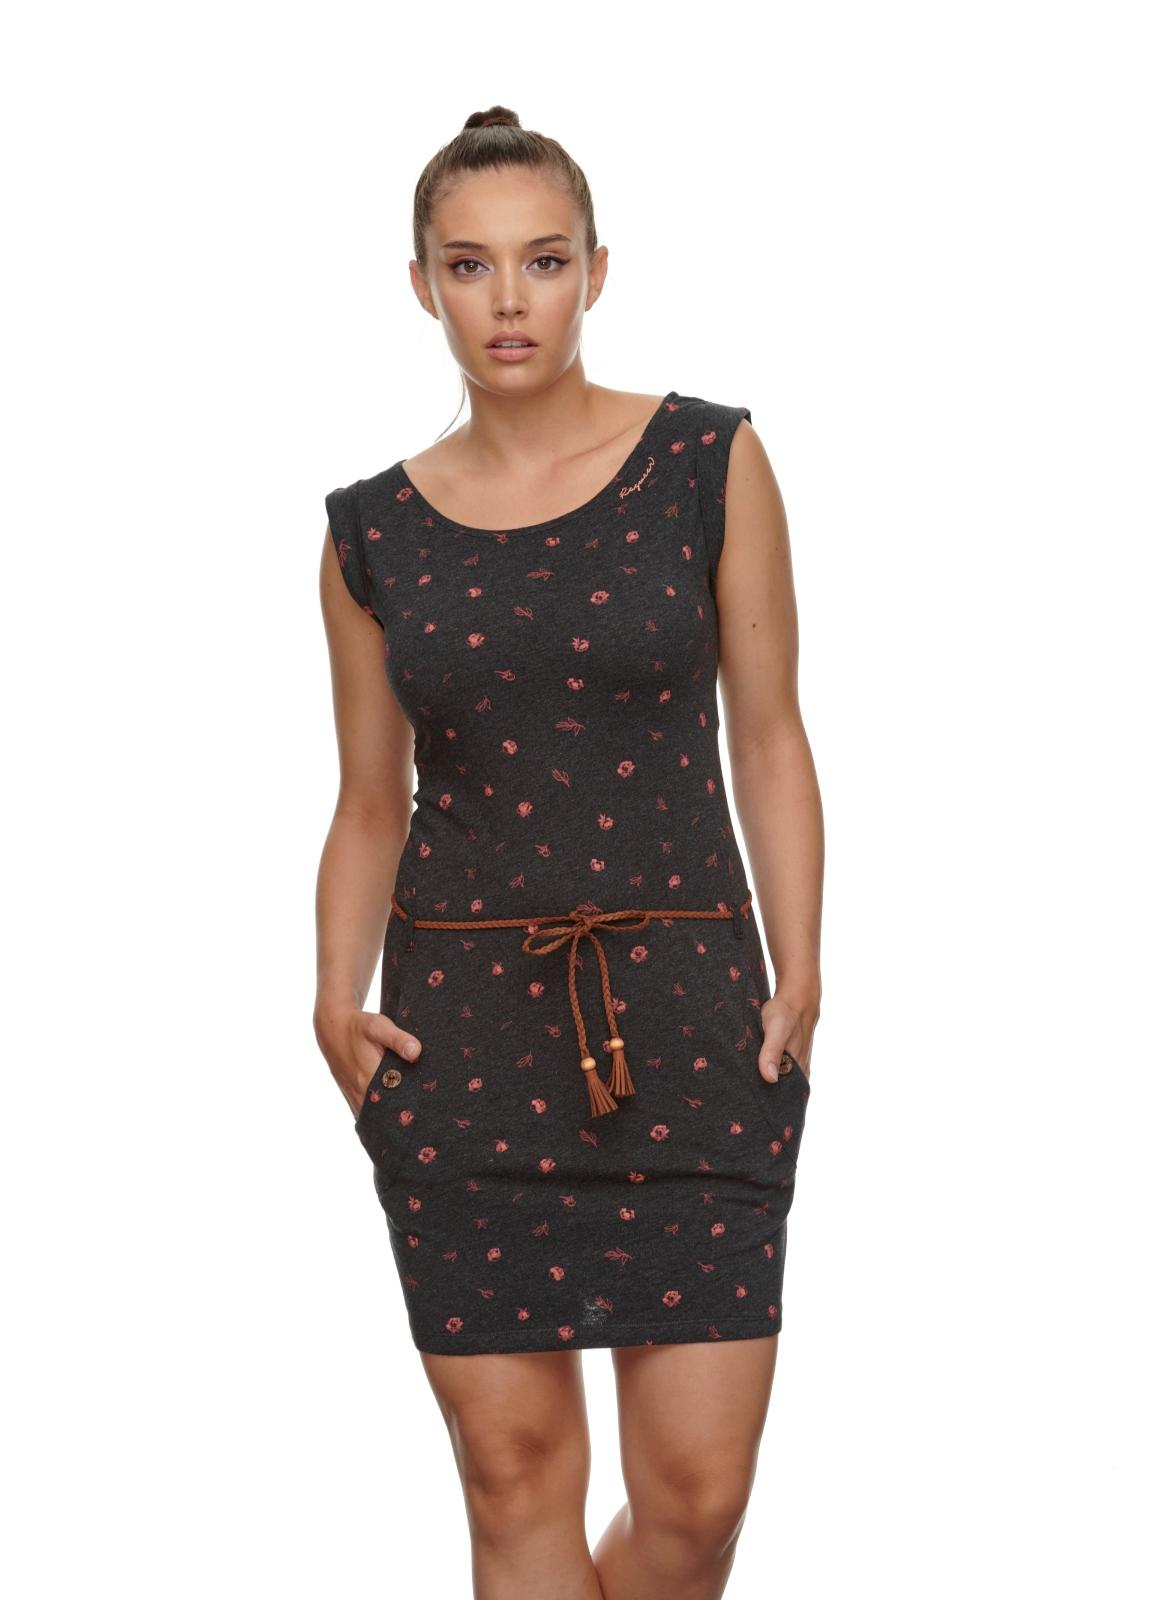 Ragwear Damen Kleid Tag B Organic schwarz rot gemustert 2111 20042 1010 black